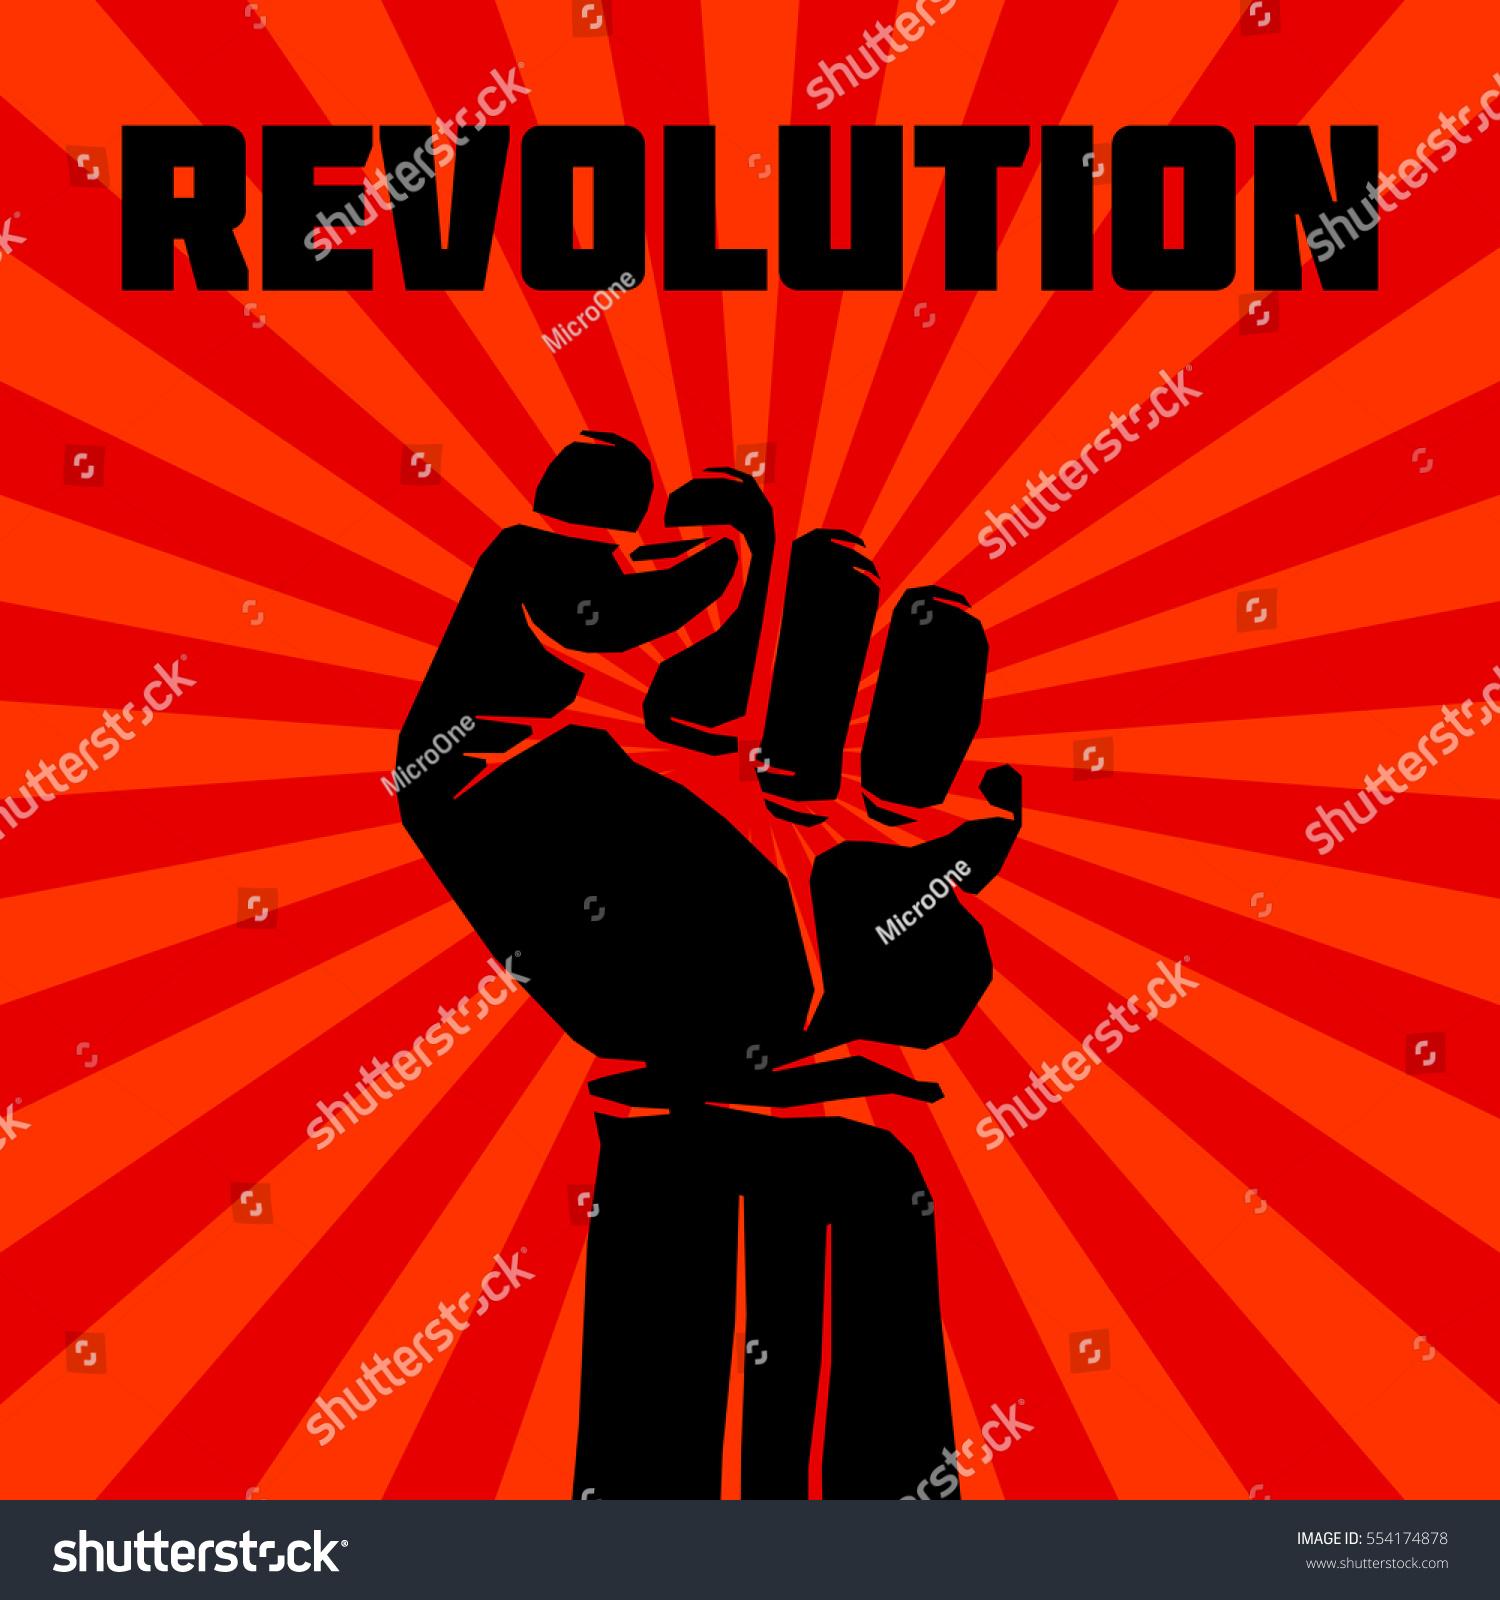 Protest Rebel Vector Revolution Art Poster Stock Vector